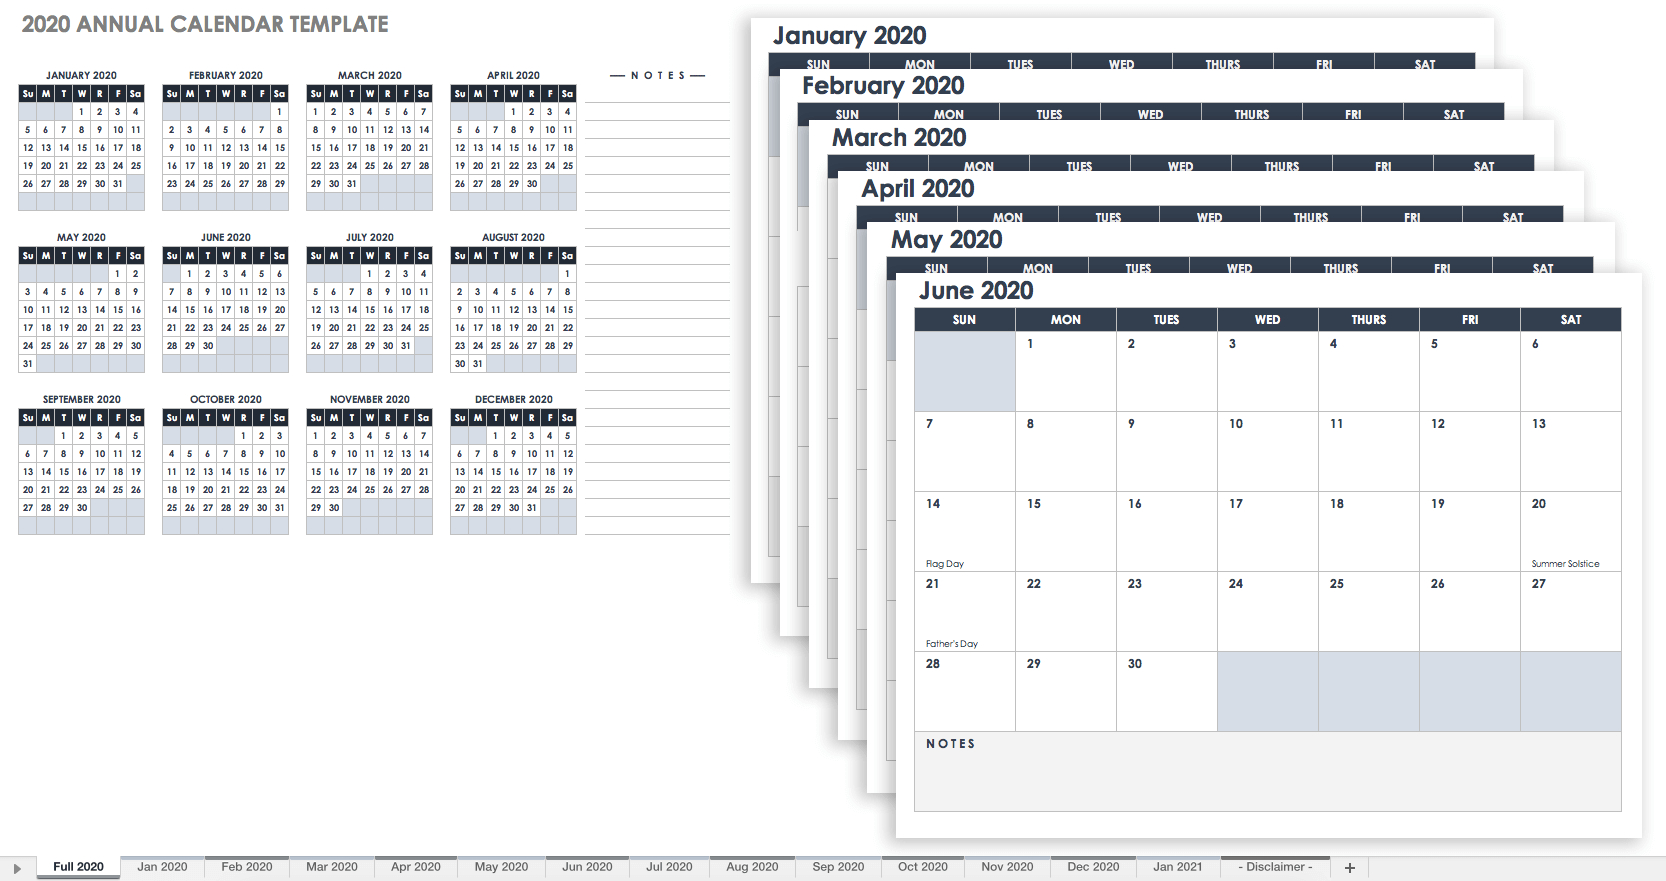 Free, Printable Excel Calendar Templates For 2019 & On | Smartsheet regarding 2020 Calendar You Can Edit